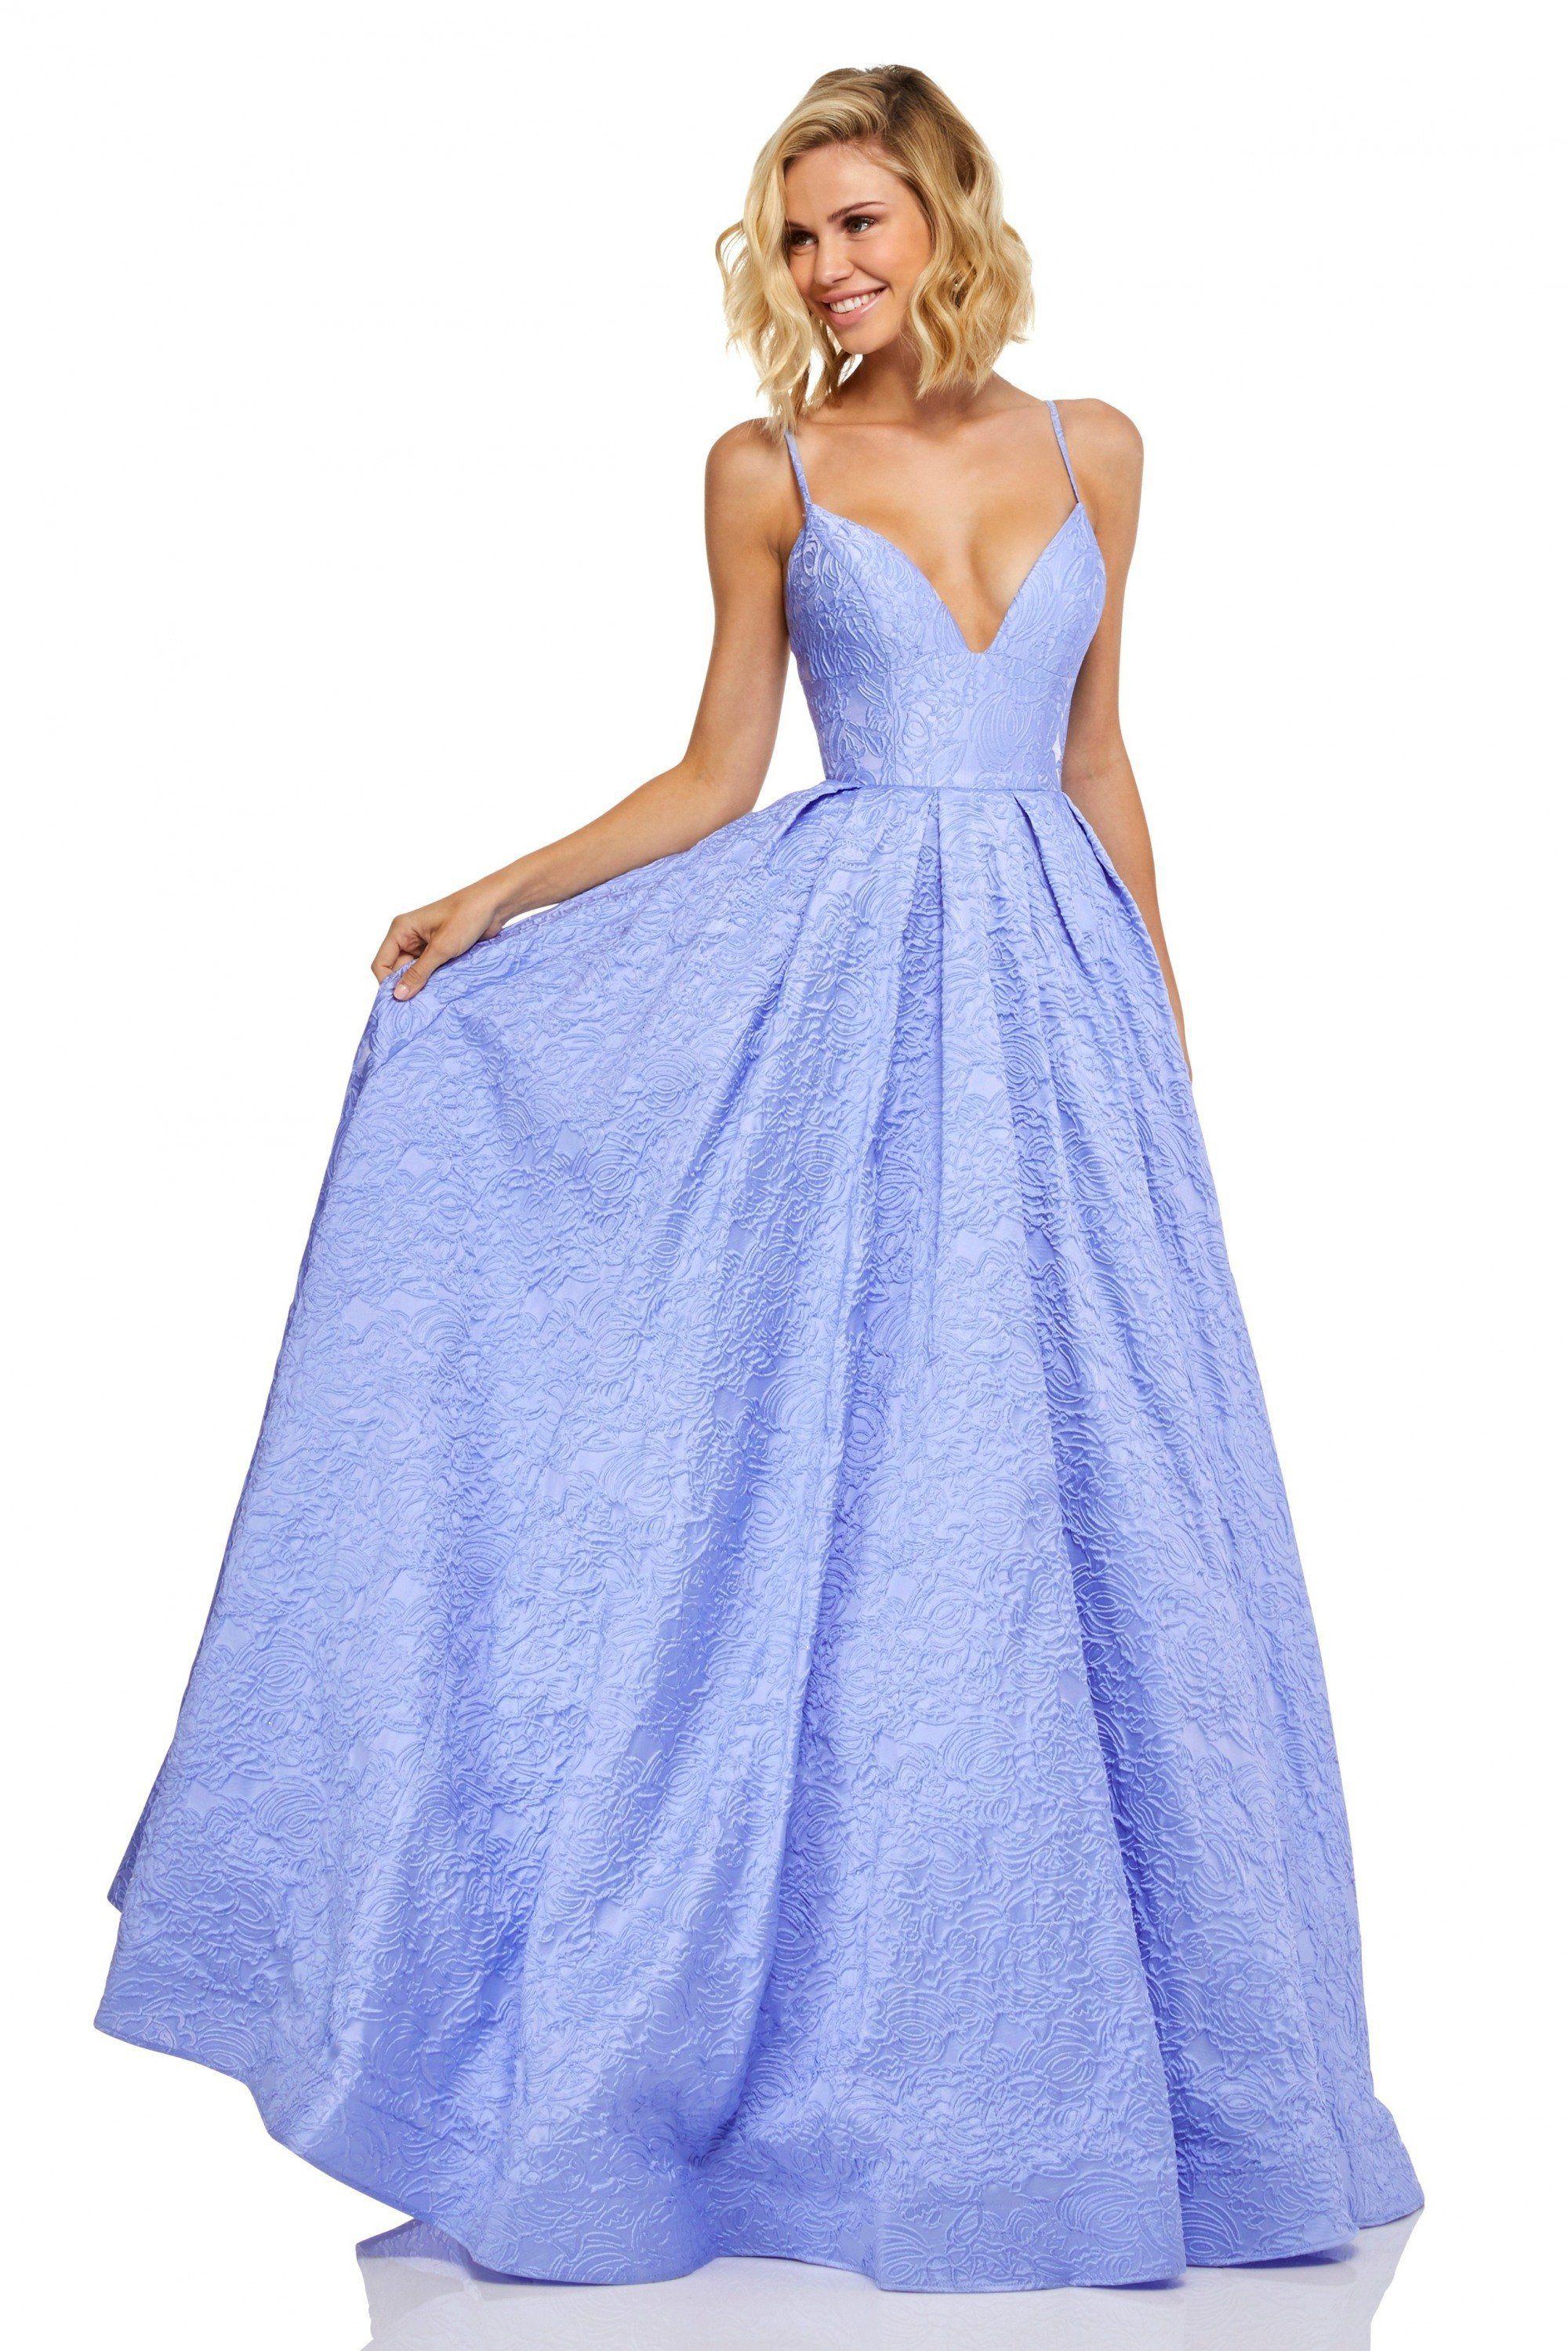 Sherri Hill 52641 Deep V Neck Pleated A Line Dress Sherri Hill Dresses Sherri Hill Prom Dresses Designer Prom Dresses [ 2998 x 2000 Pixel ]